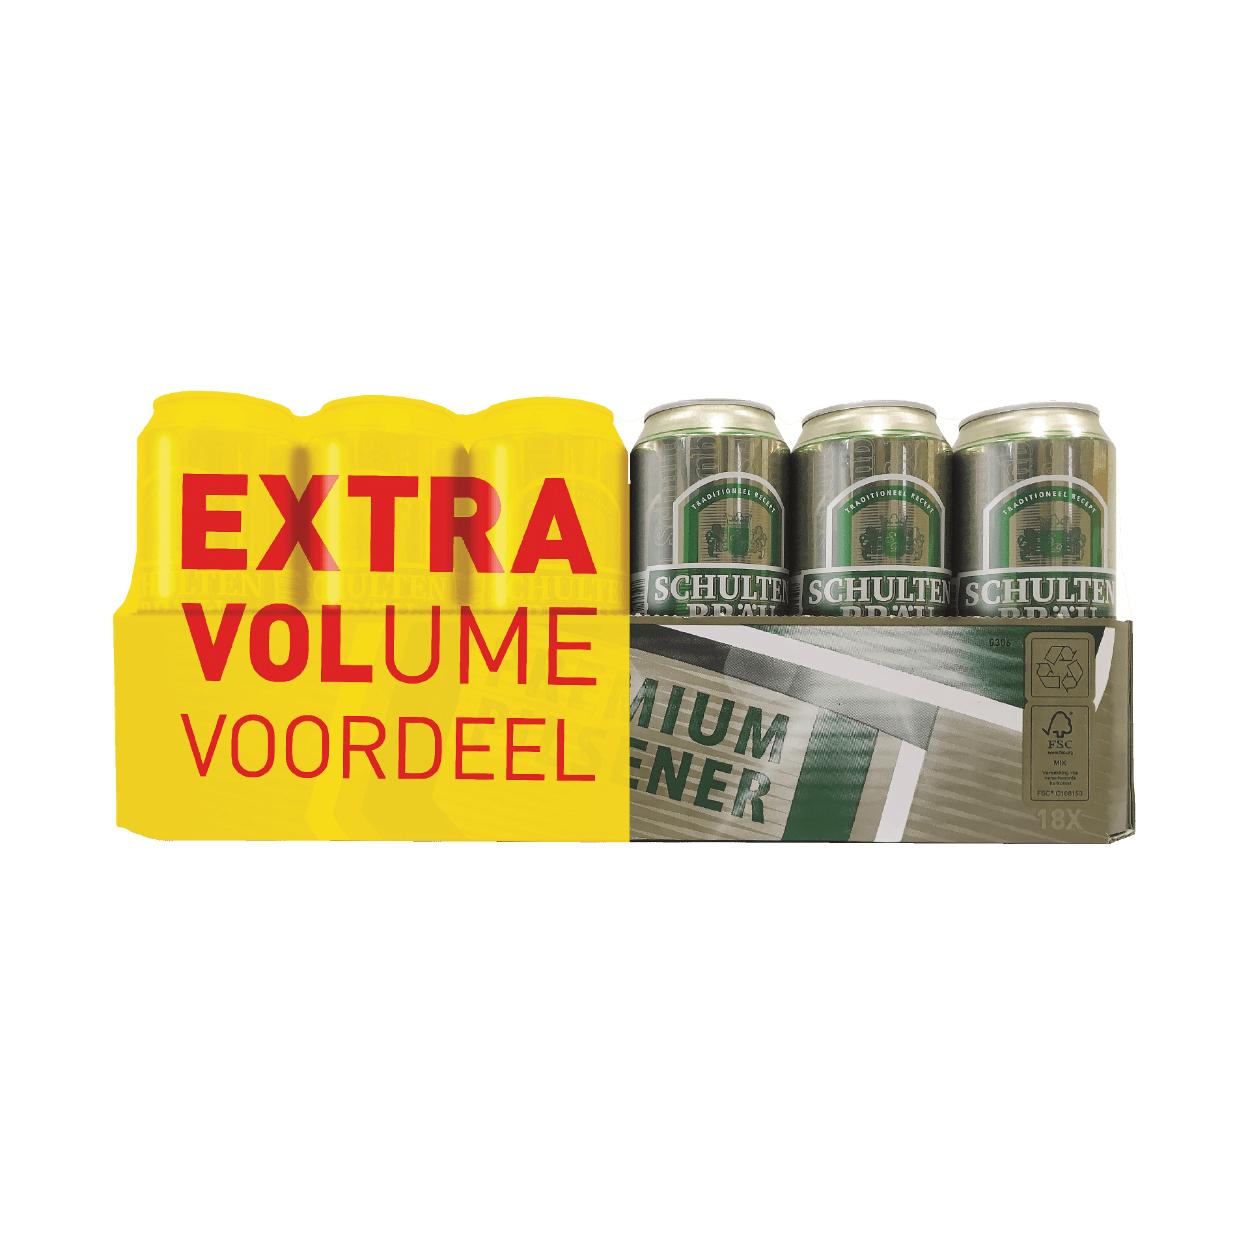 Schultenbräu pils voor €6.99 (18 x 50 cl) @ Aldi